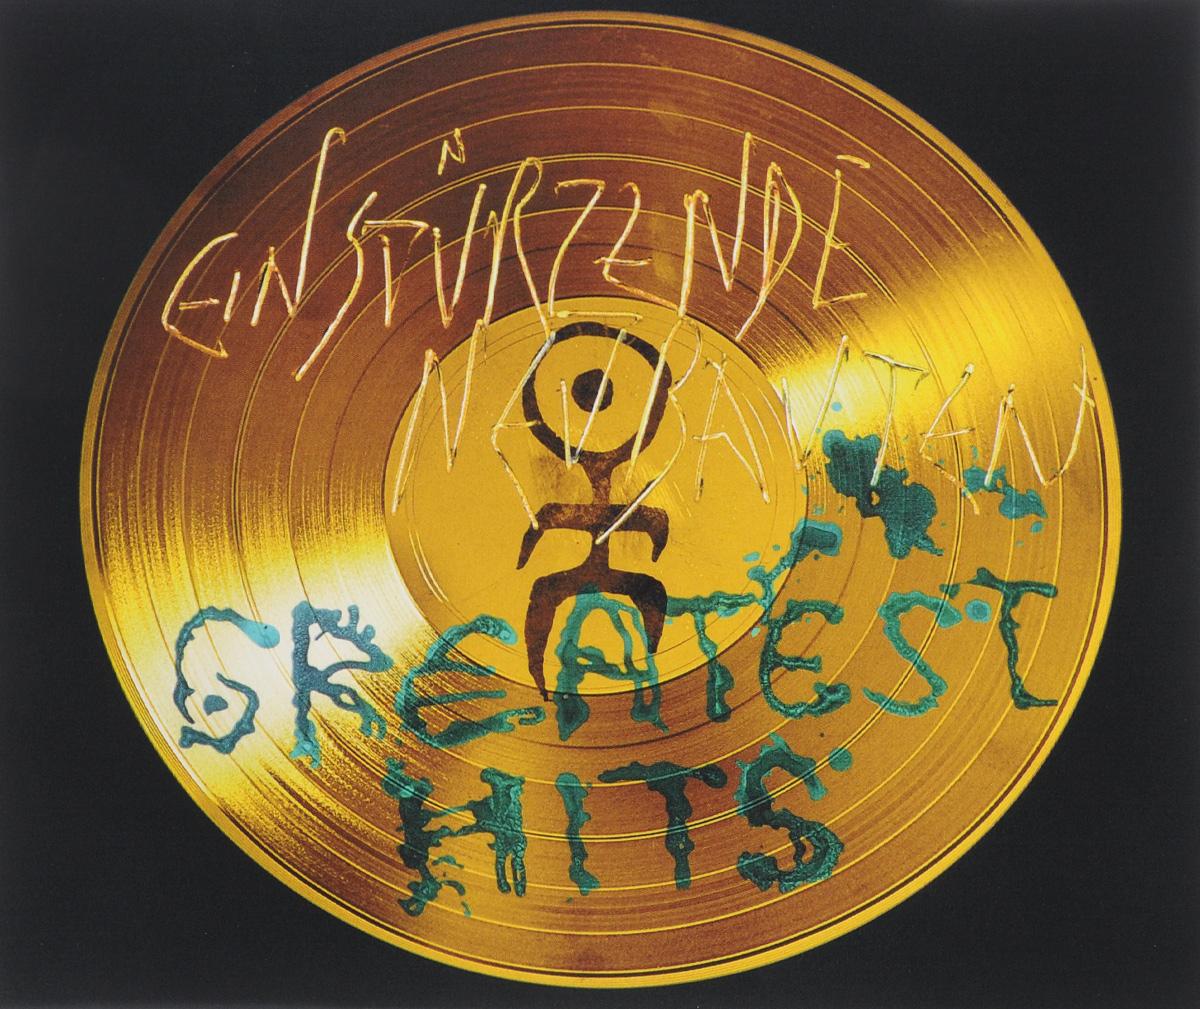 Einsturzende Neubauten. Greatest Hits энрике иглесиас enrique iglesias greatest hits deluxe edition cd dvd